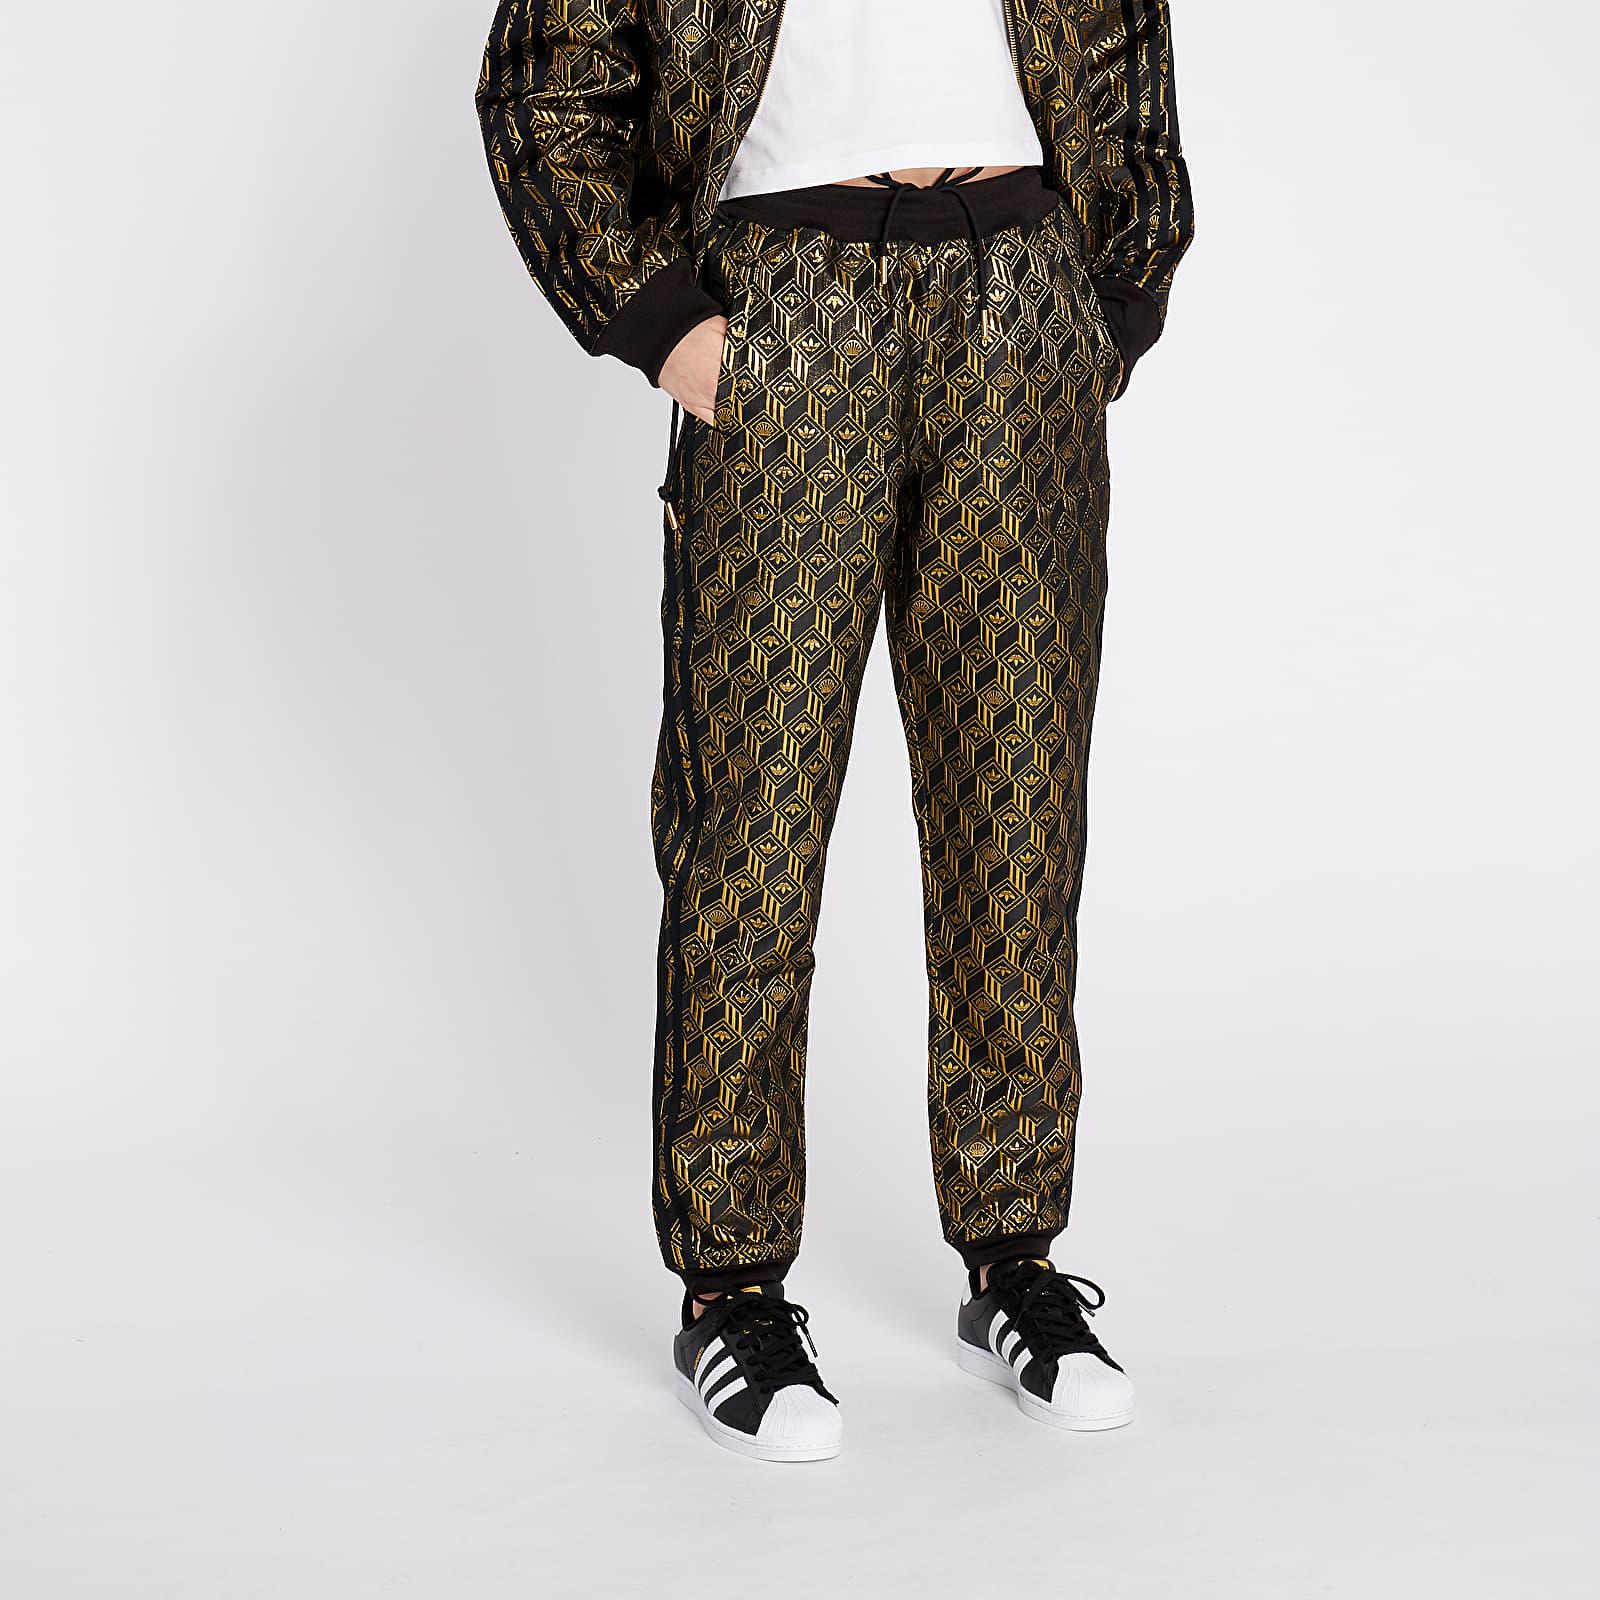 Jeans e pantaloni adidas Premium Superstar Trackpants Black/ Golden Metallic